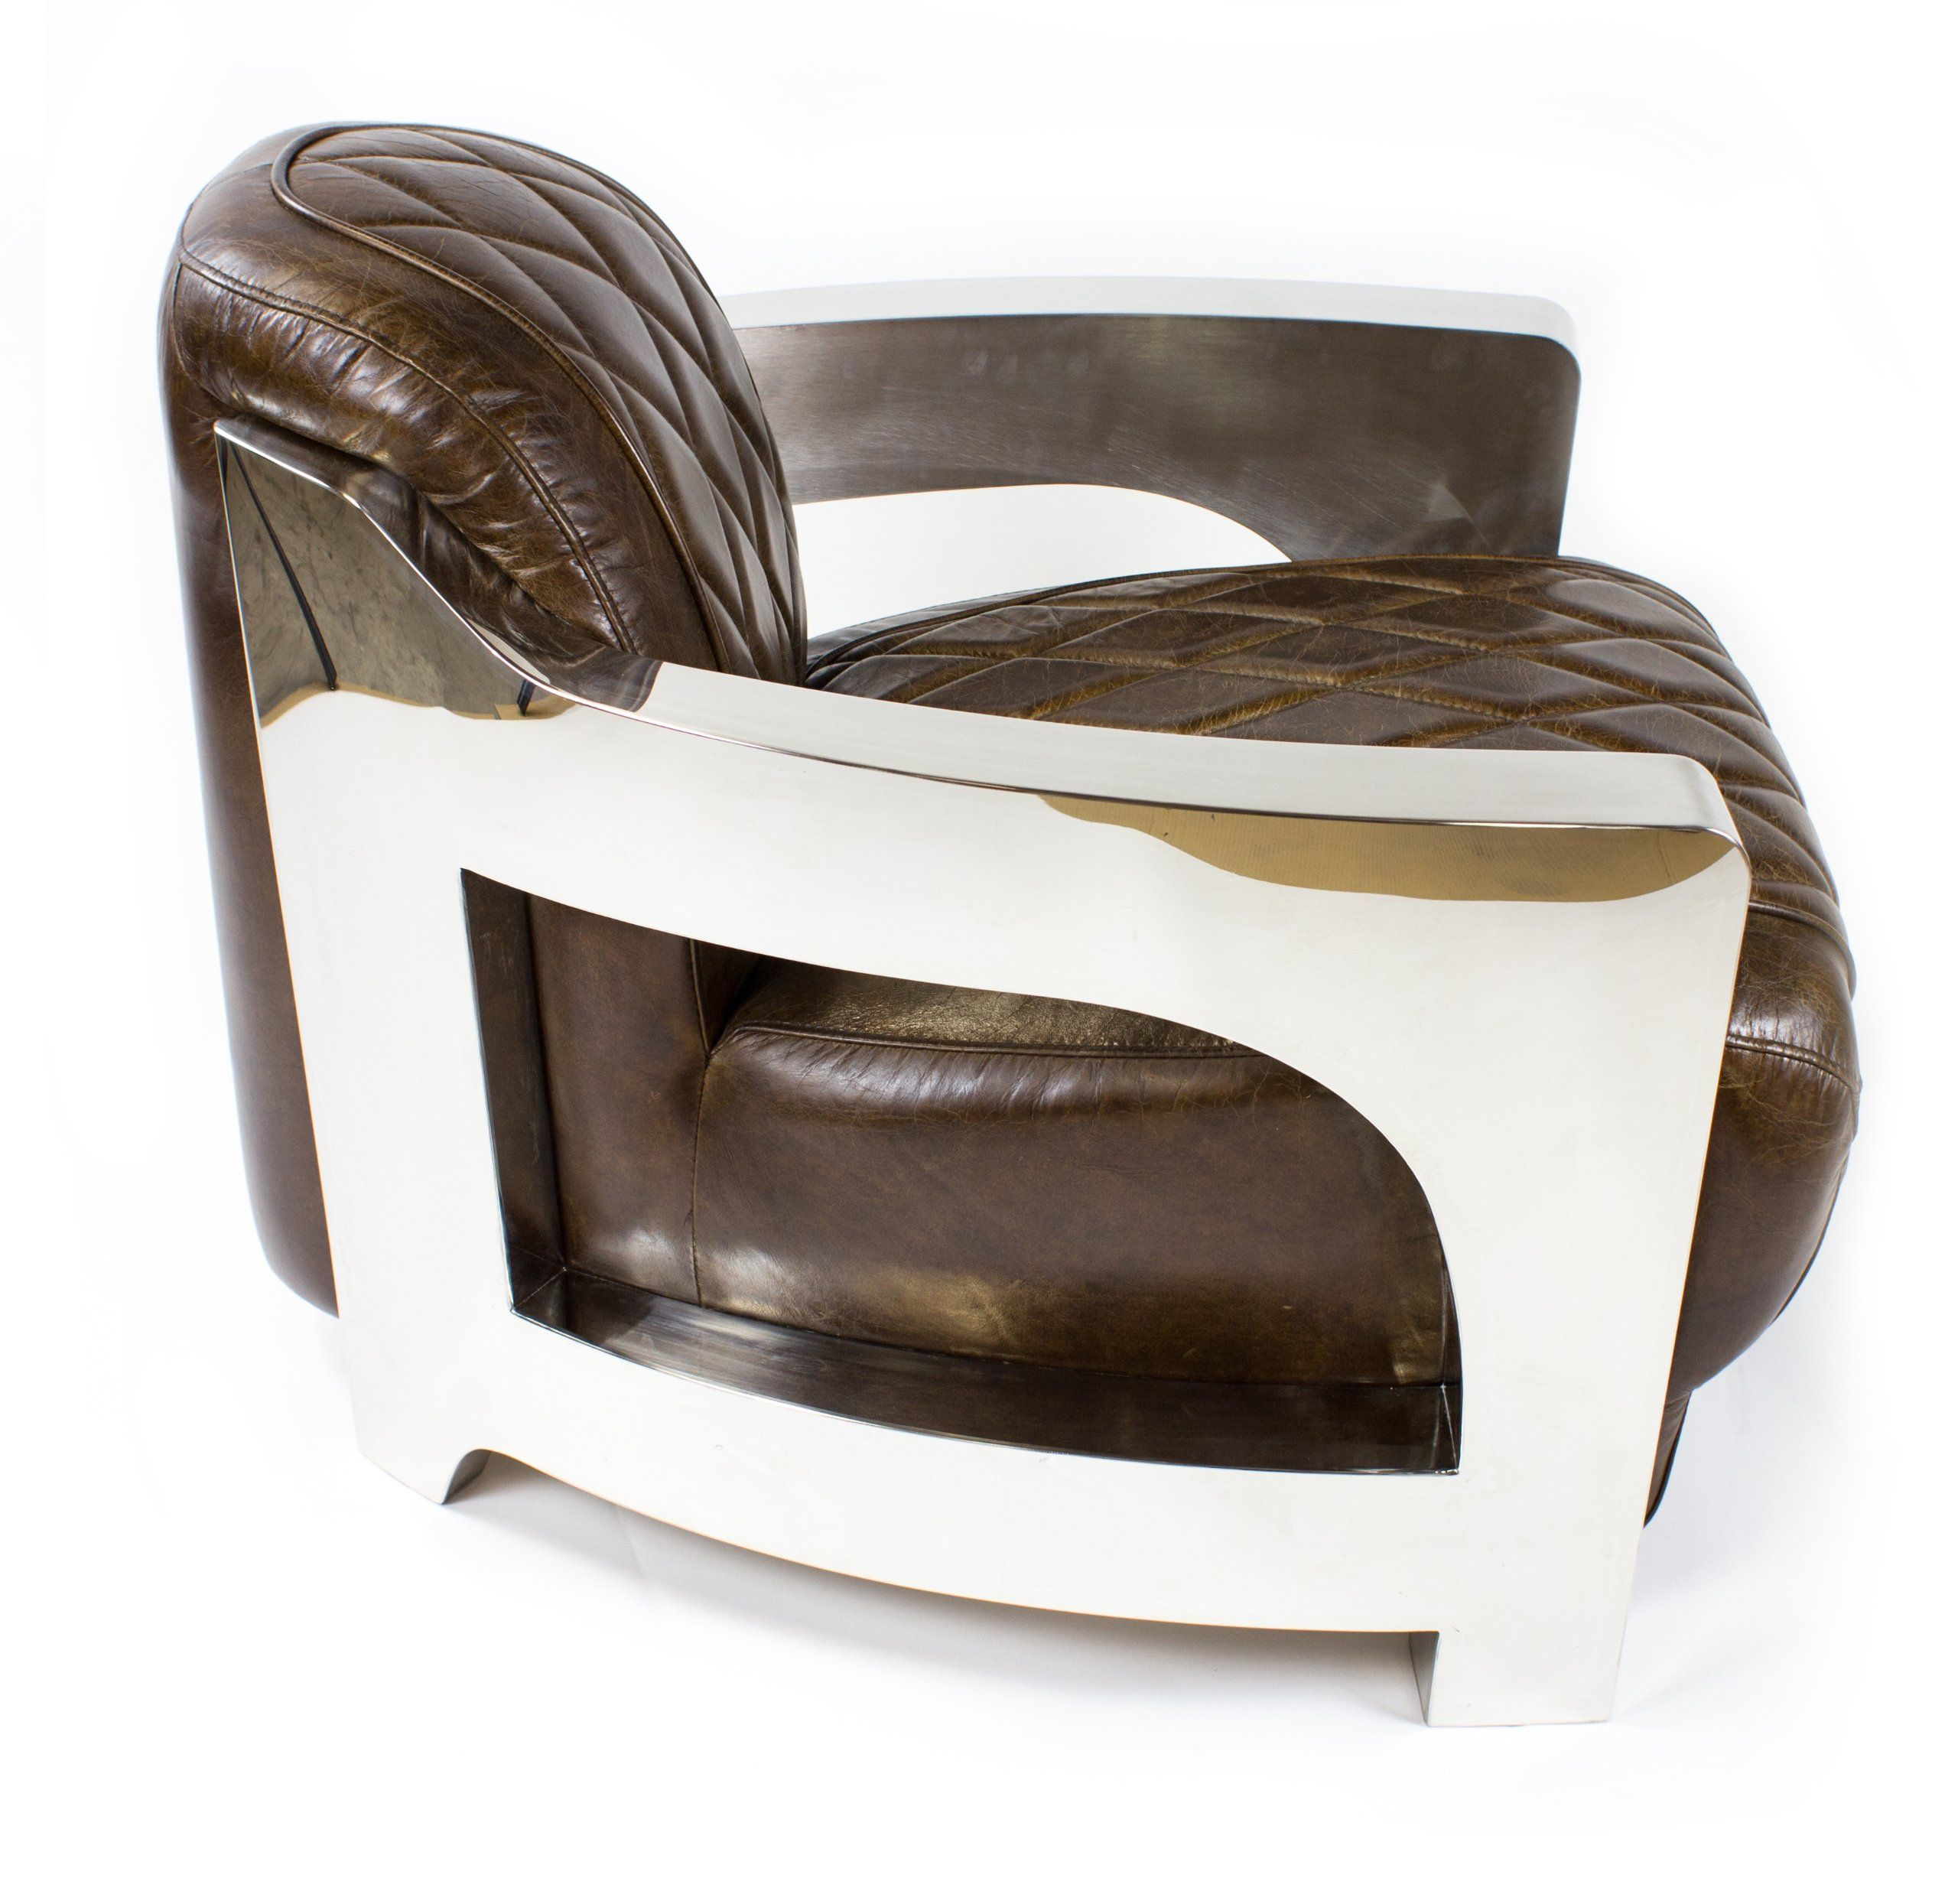 Ledersessel Design vintage echtleder sessel edelstahl ledersessel design lounge sofa